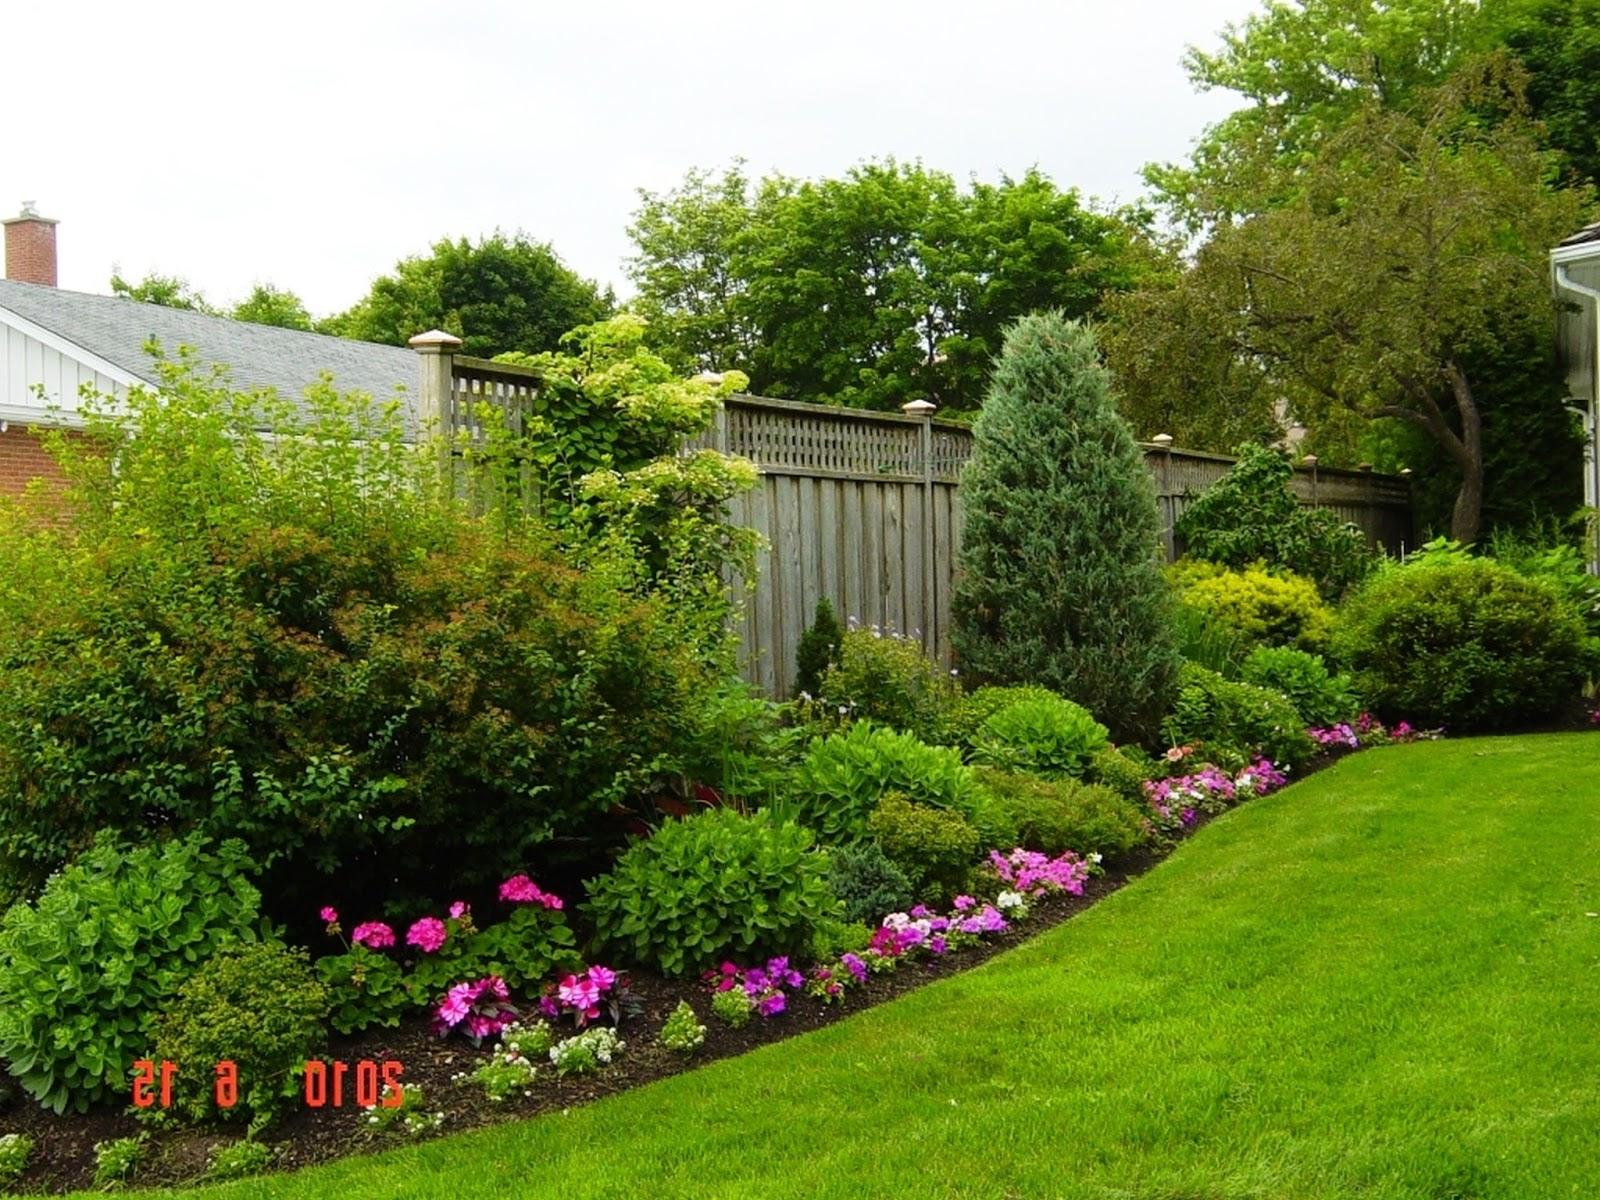 backyard-features-garden-design-ideas-fascinating-premiertransgarden-house-landscape-garden-landscape-fence-landscape-landscaping-ideas-home-landscaping-magazines-landscaping-magazines-l